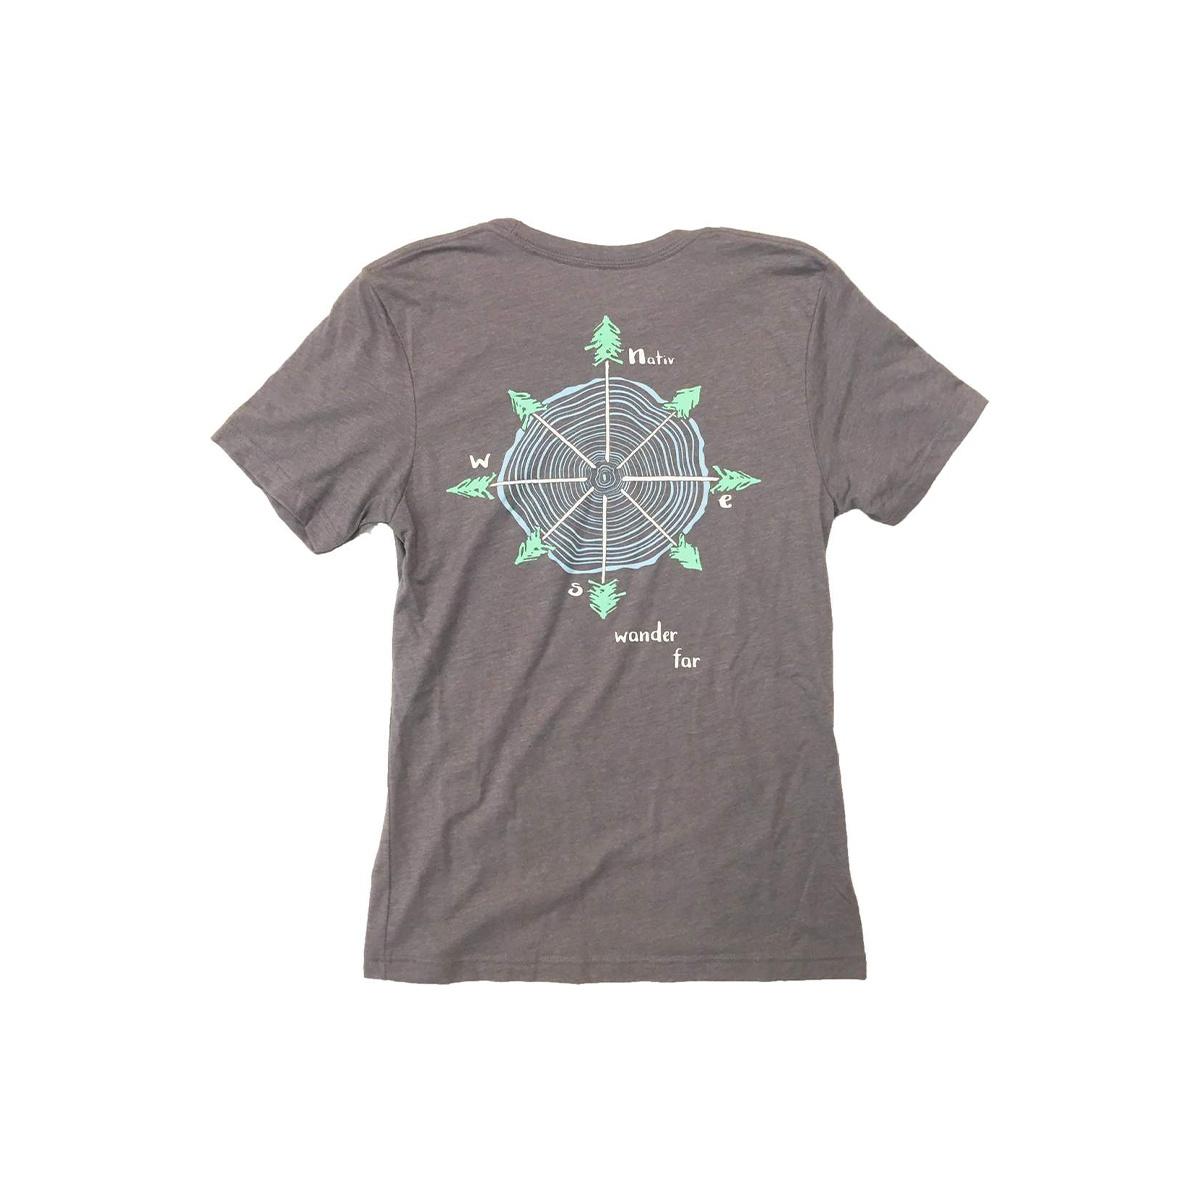 Nativ Compass Short Sleeve